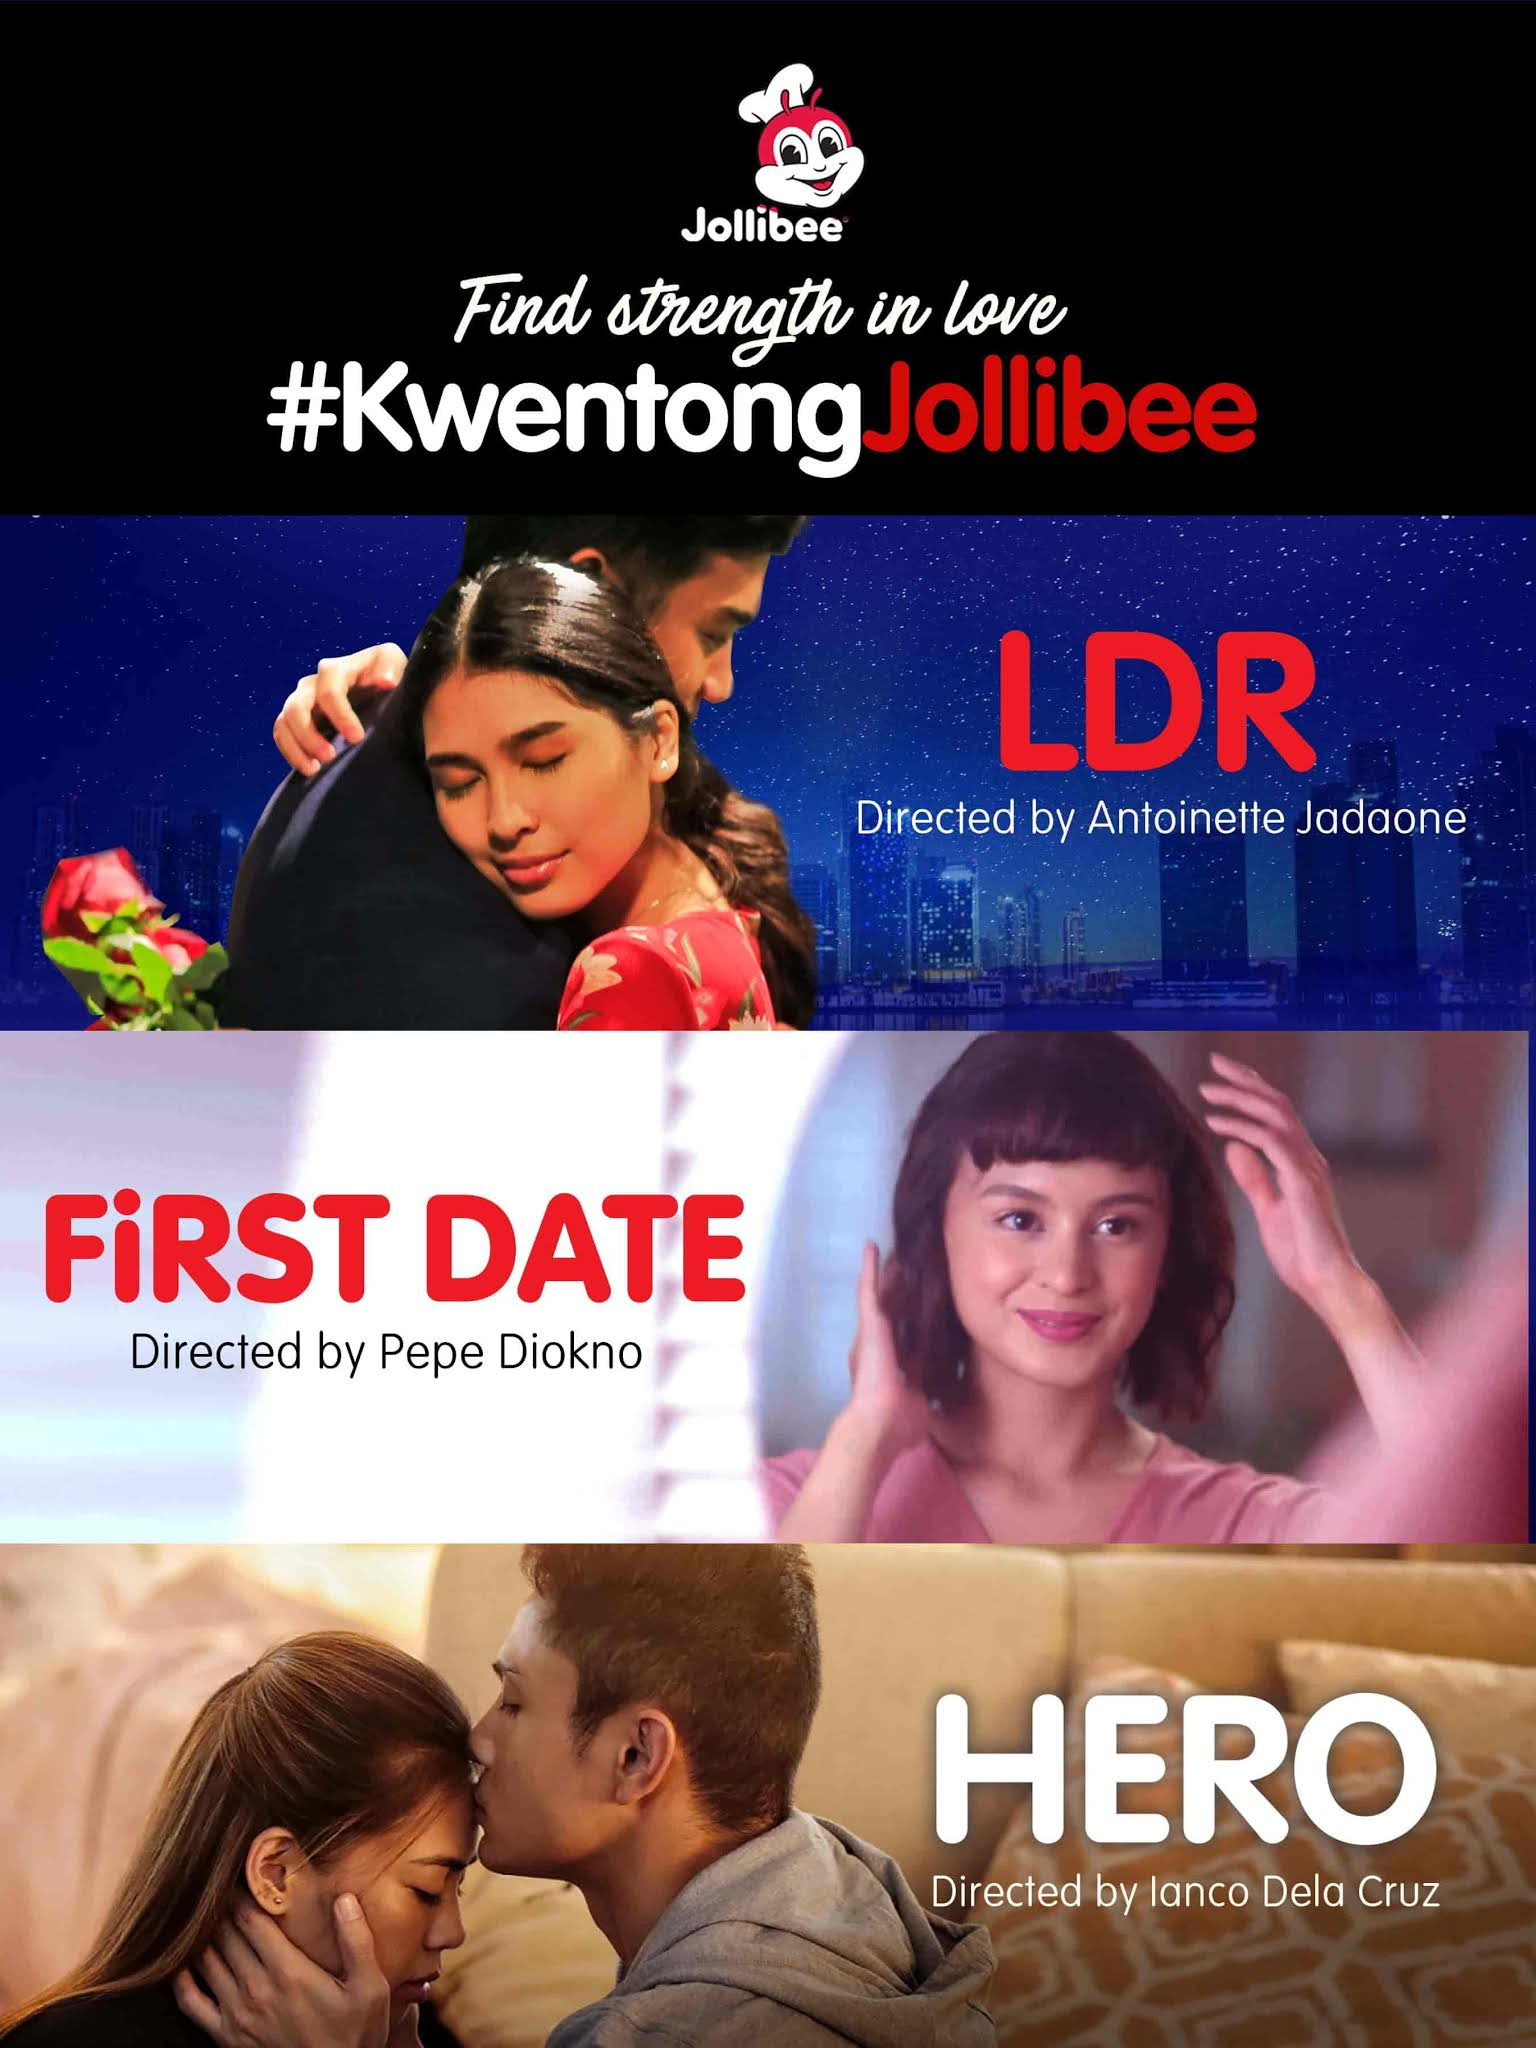 Trending Video: Latest Kwentong Jollibee Valentines Series [2021] Lockdown Relationship LDR | First Date | Hero